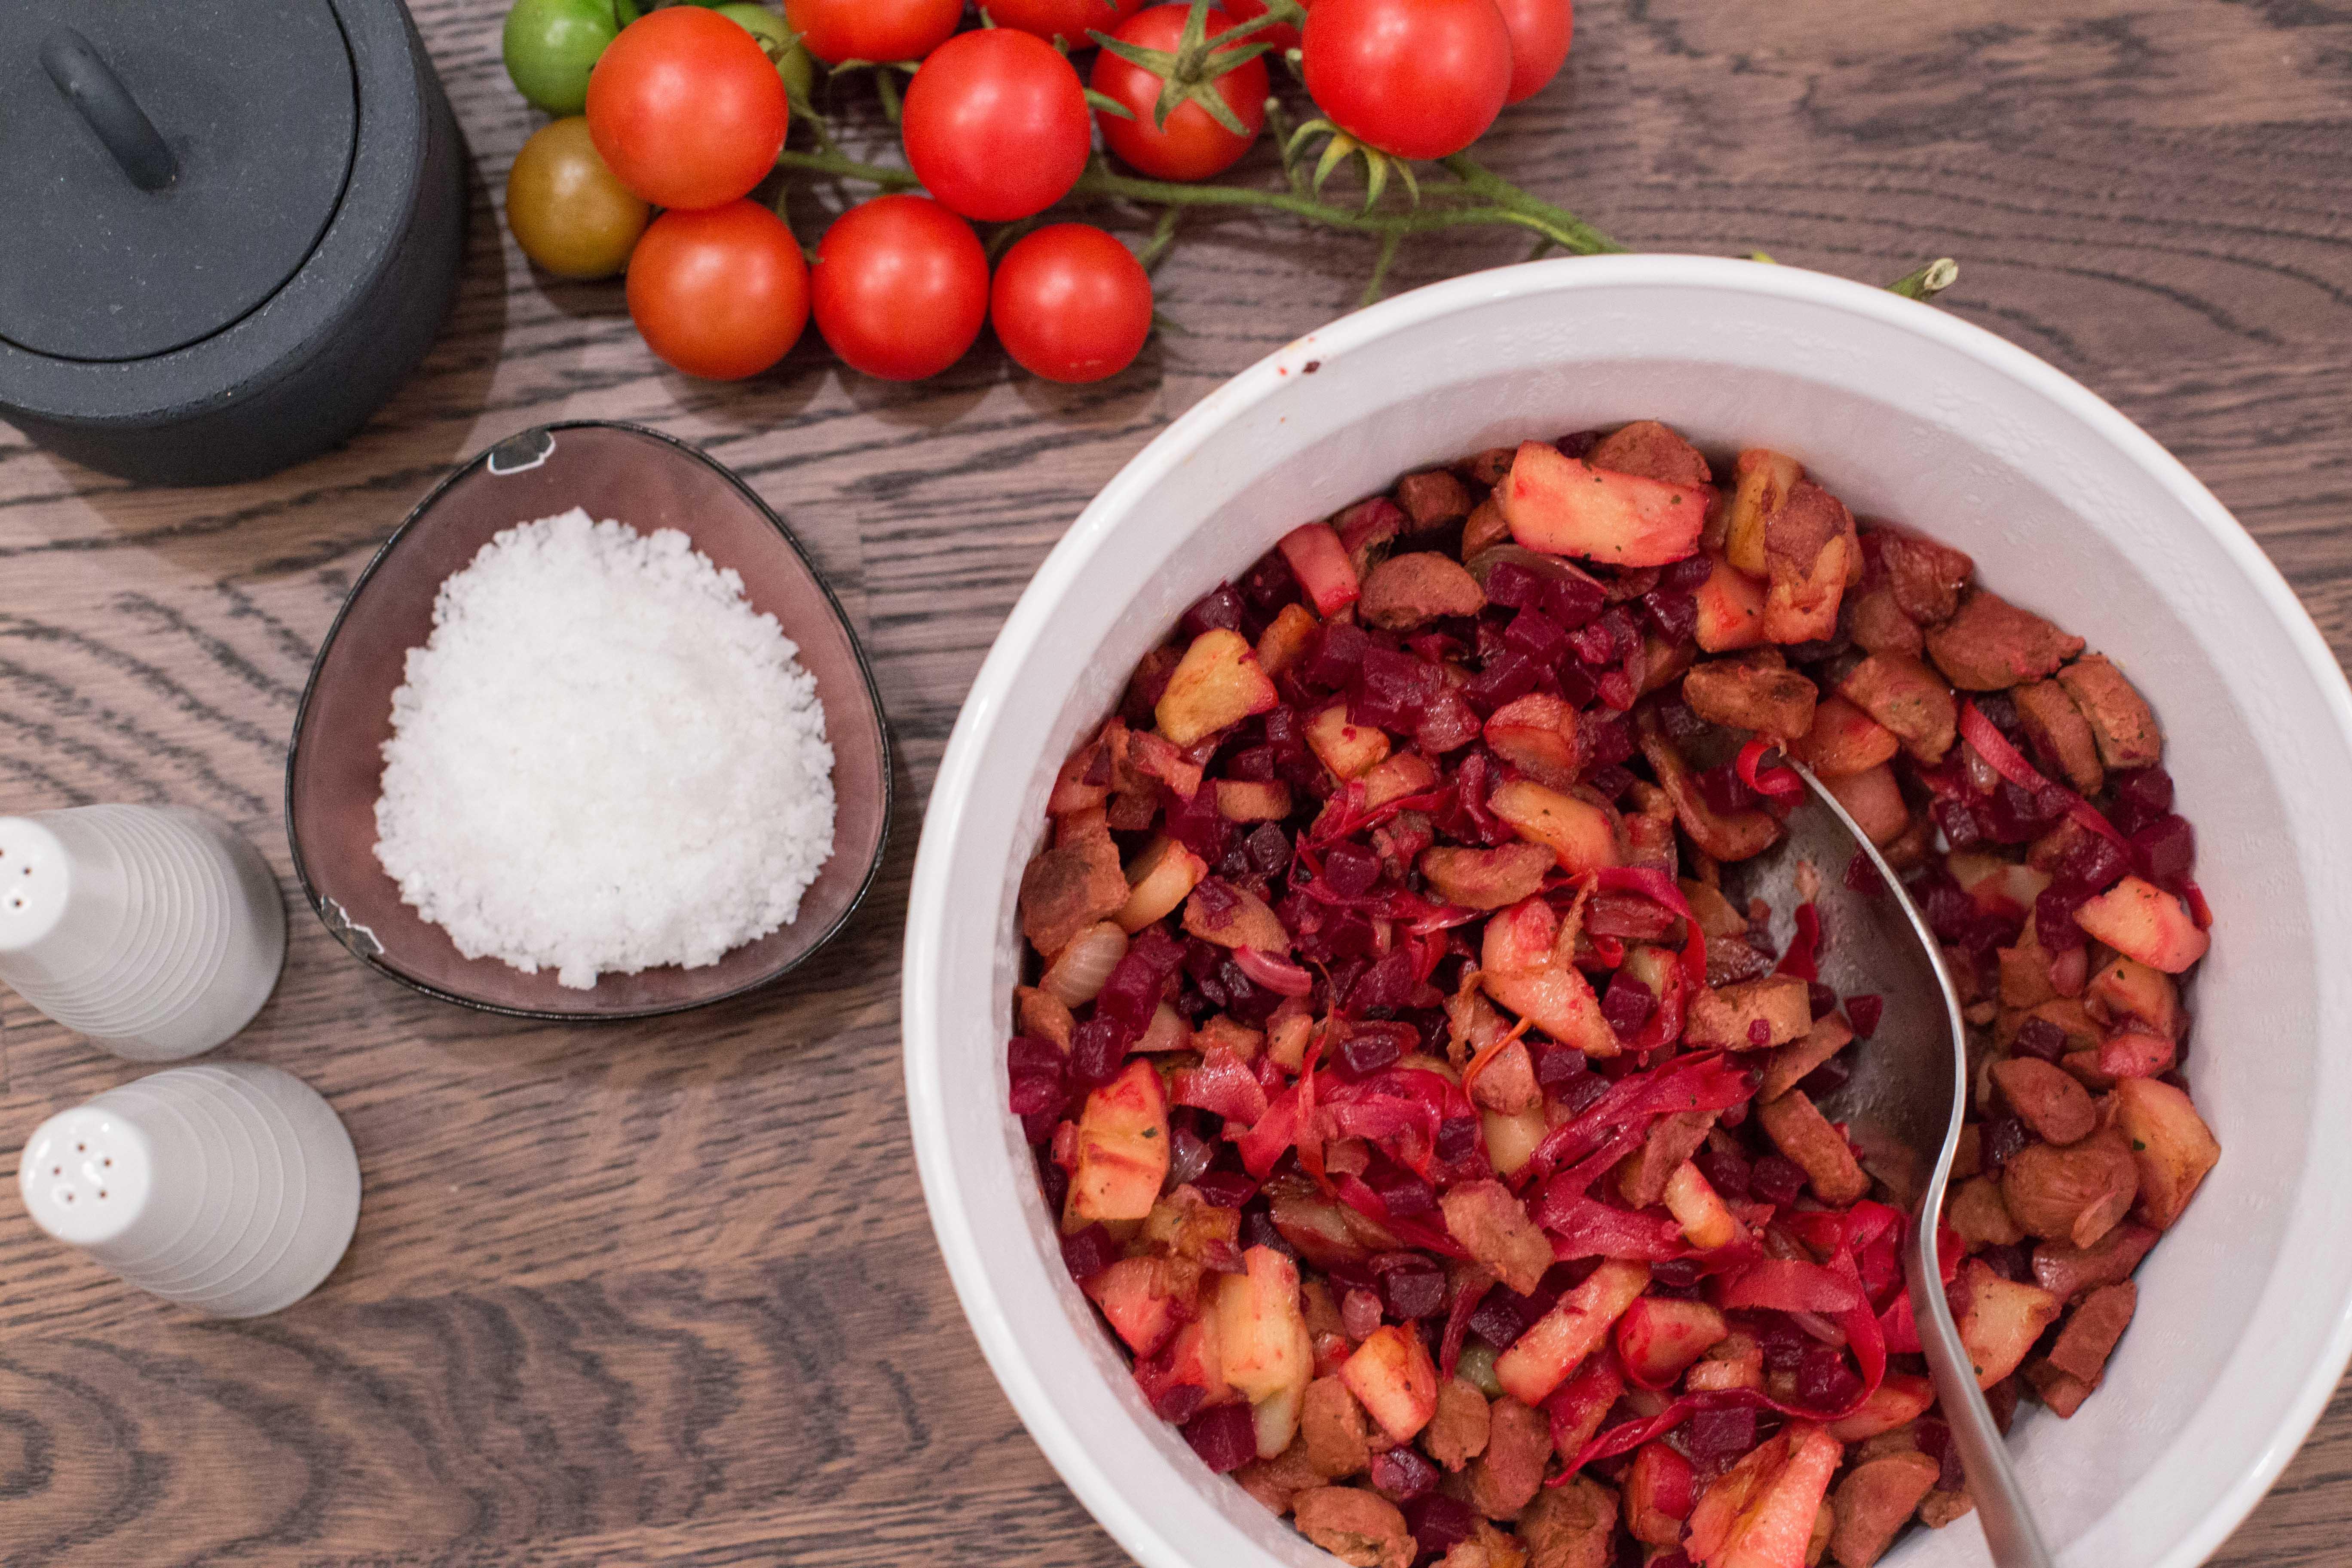 Veckans Vego: Vegetarisk pytt i panna